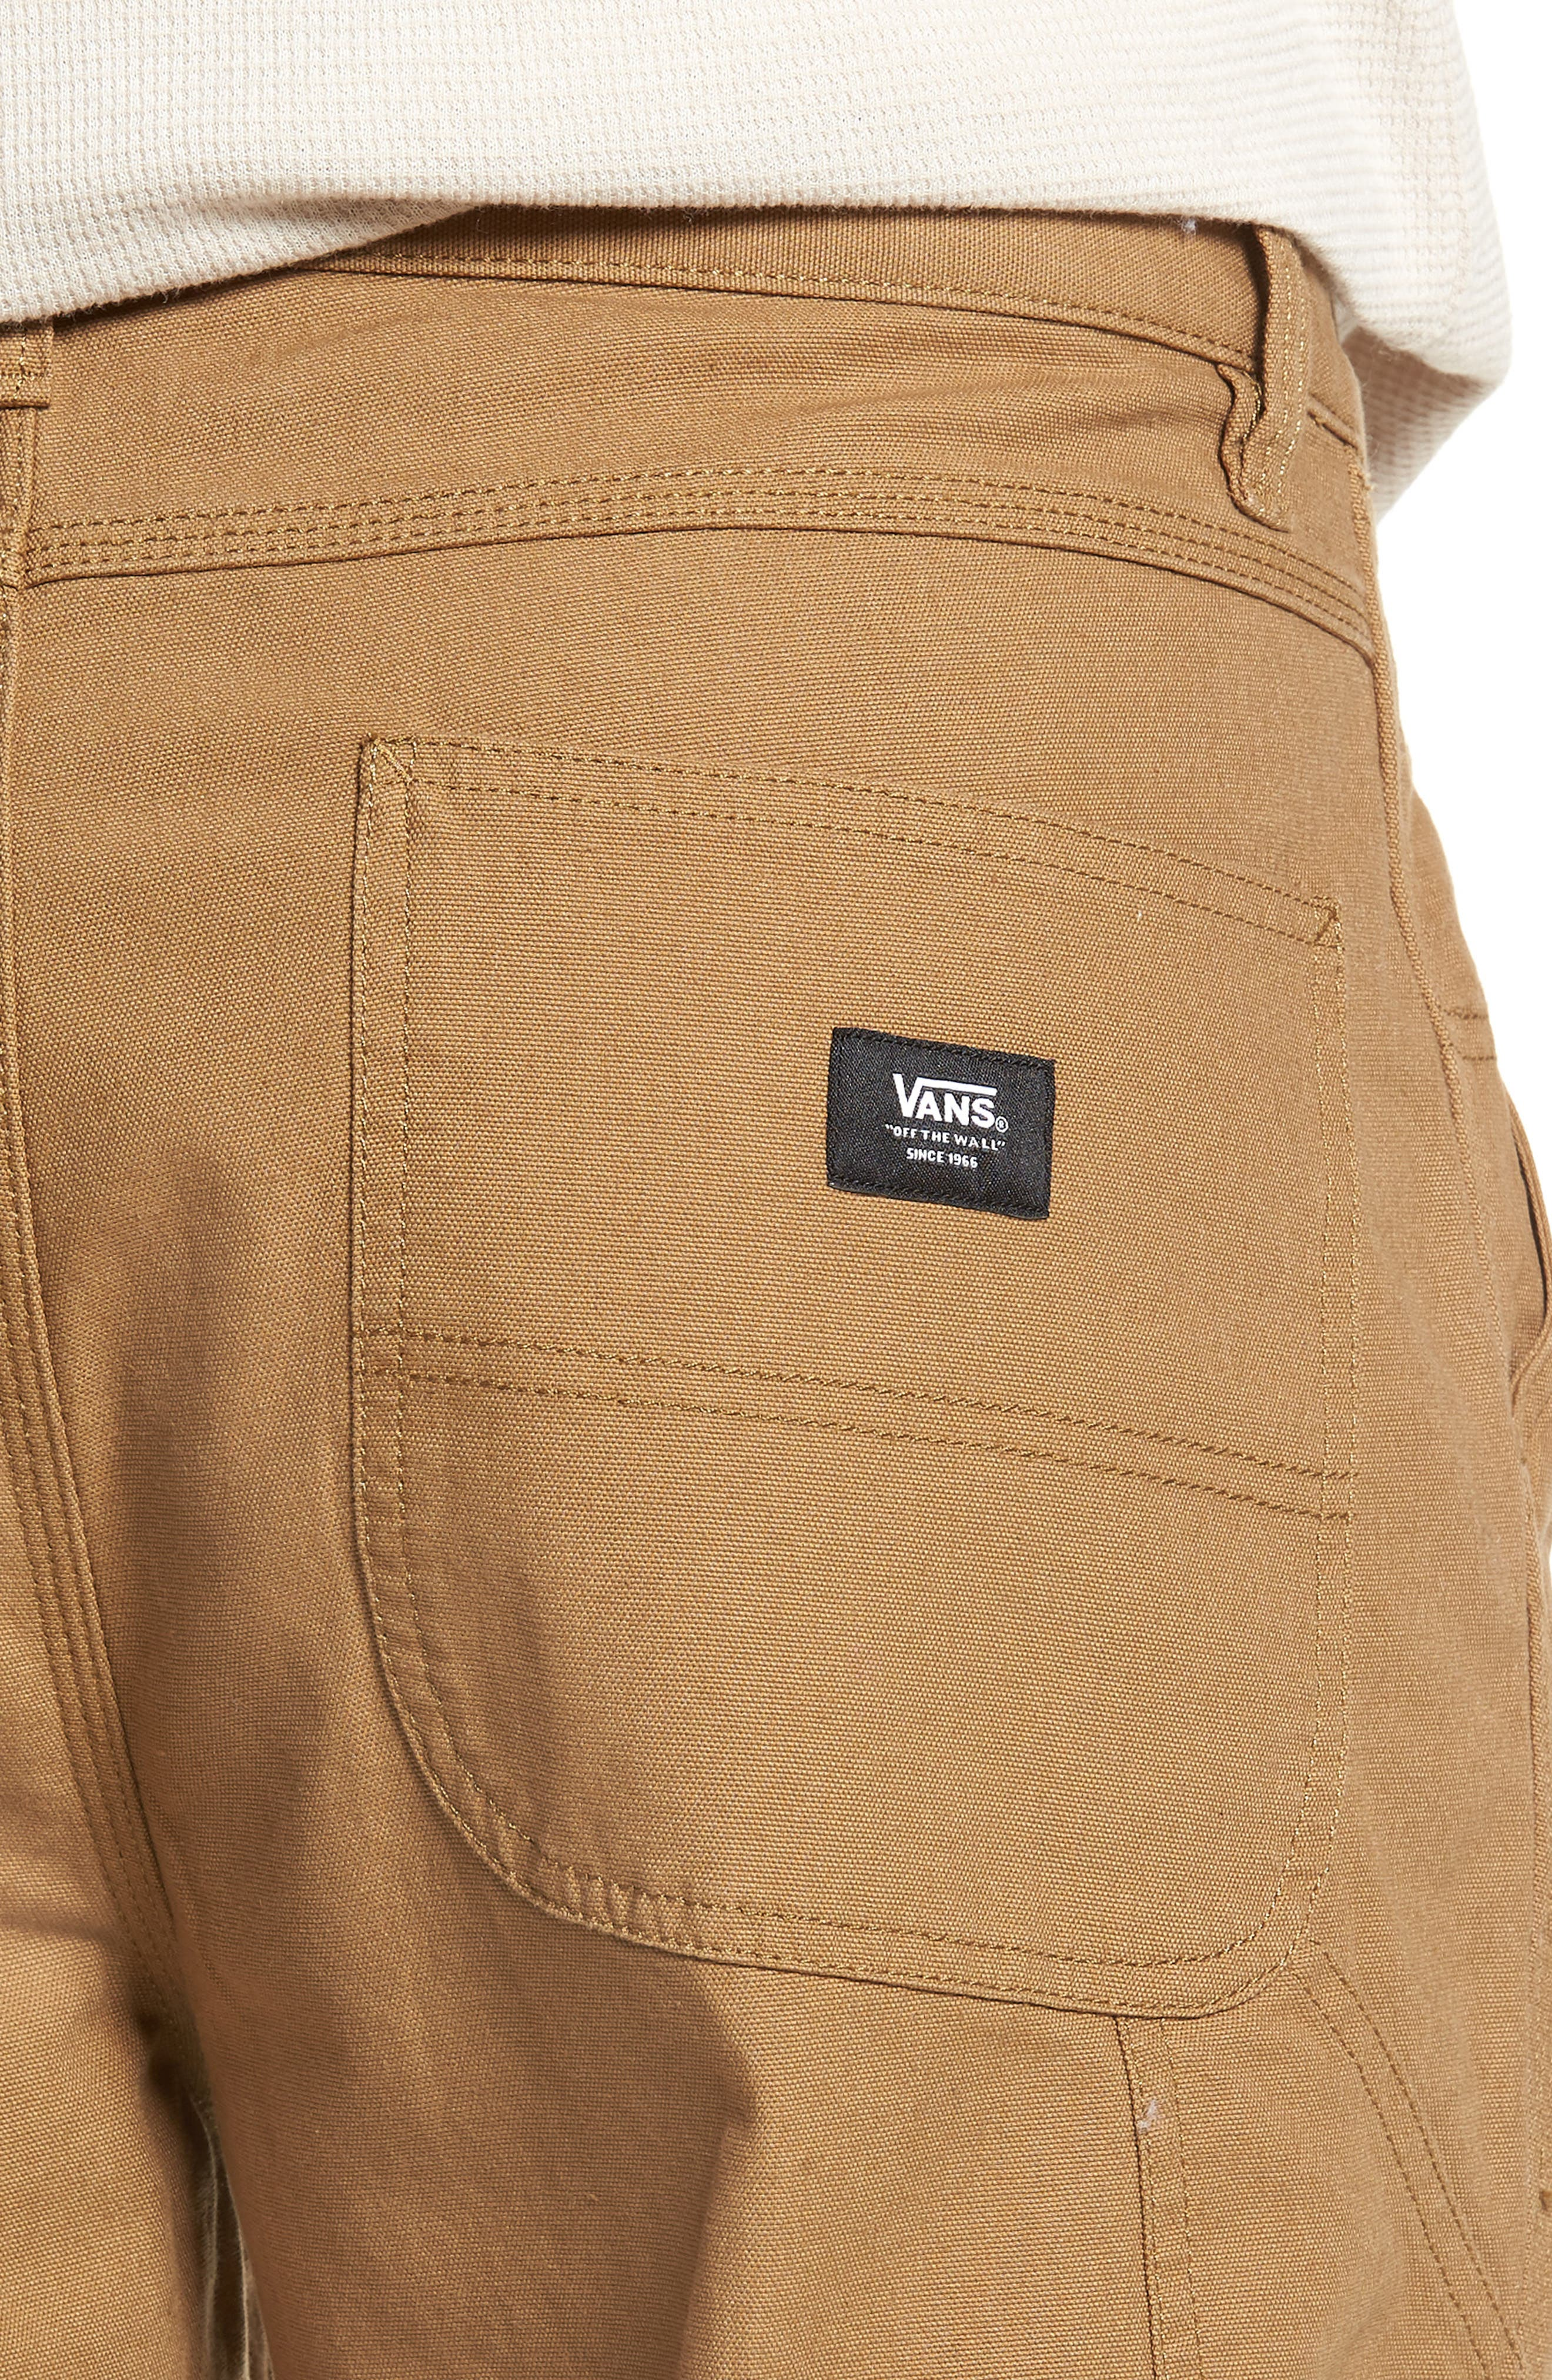 Hardware Straight Fit Carpenter Pants,                             Alternate thumbnail 4, color,                             DIRT